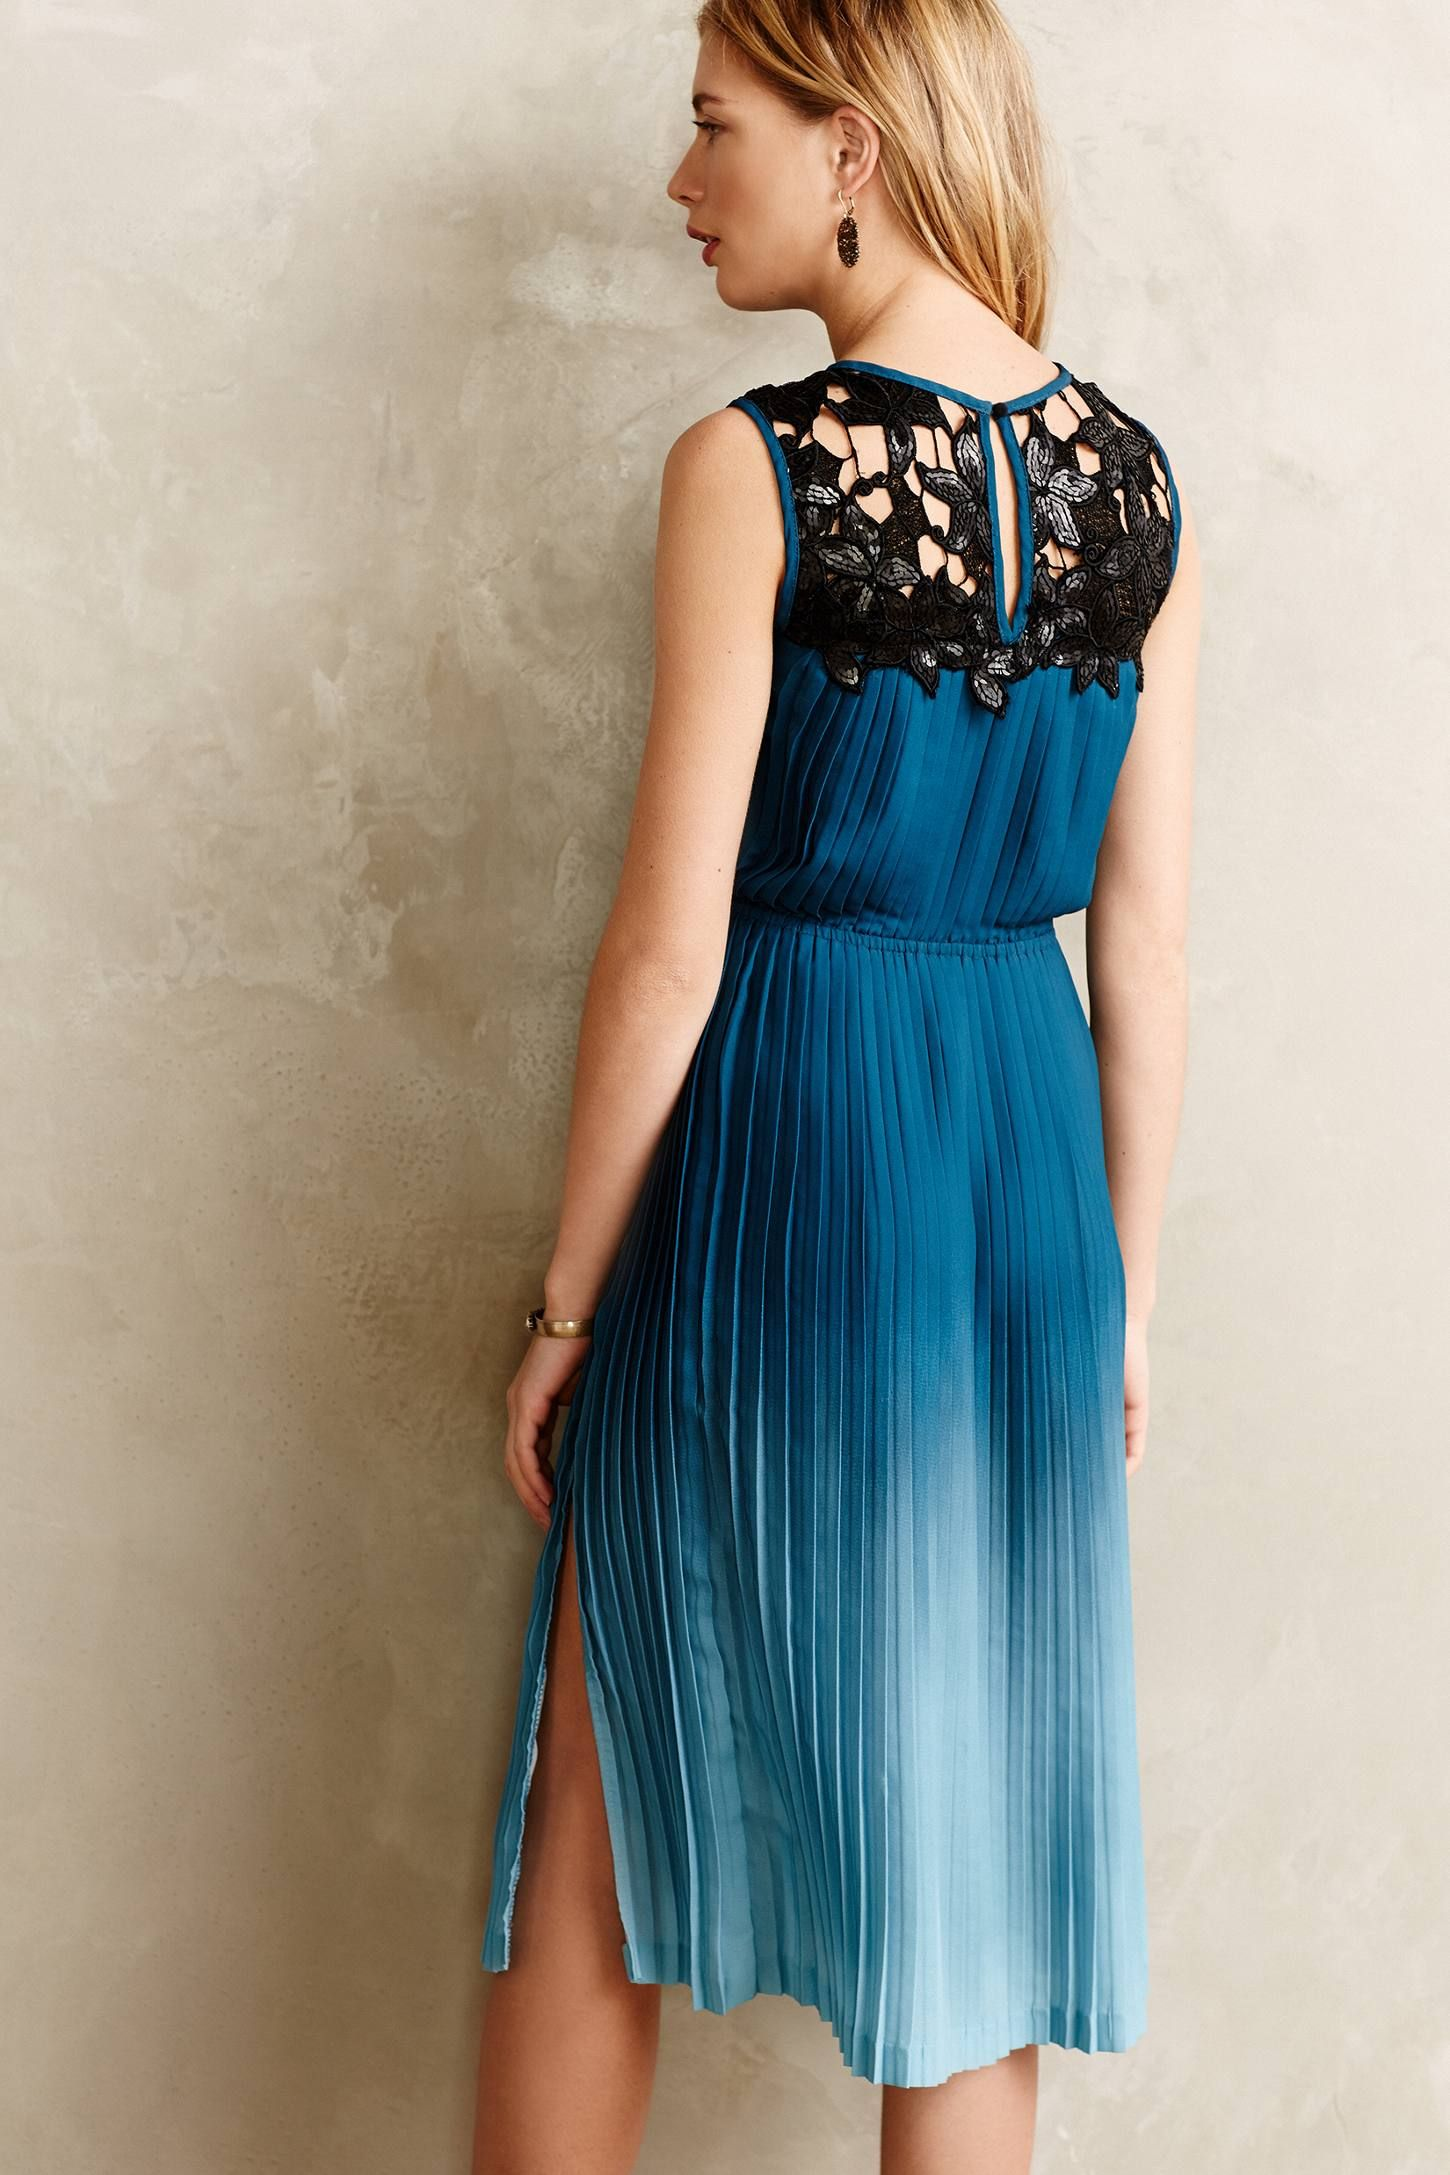 Cerulean Depths Midi Dress - anthropologie.com